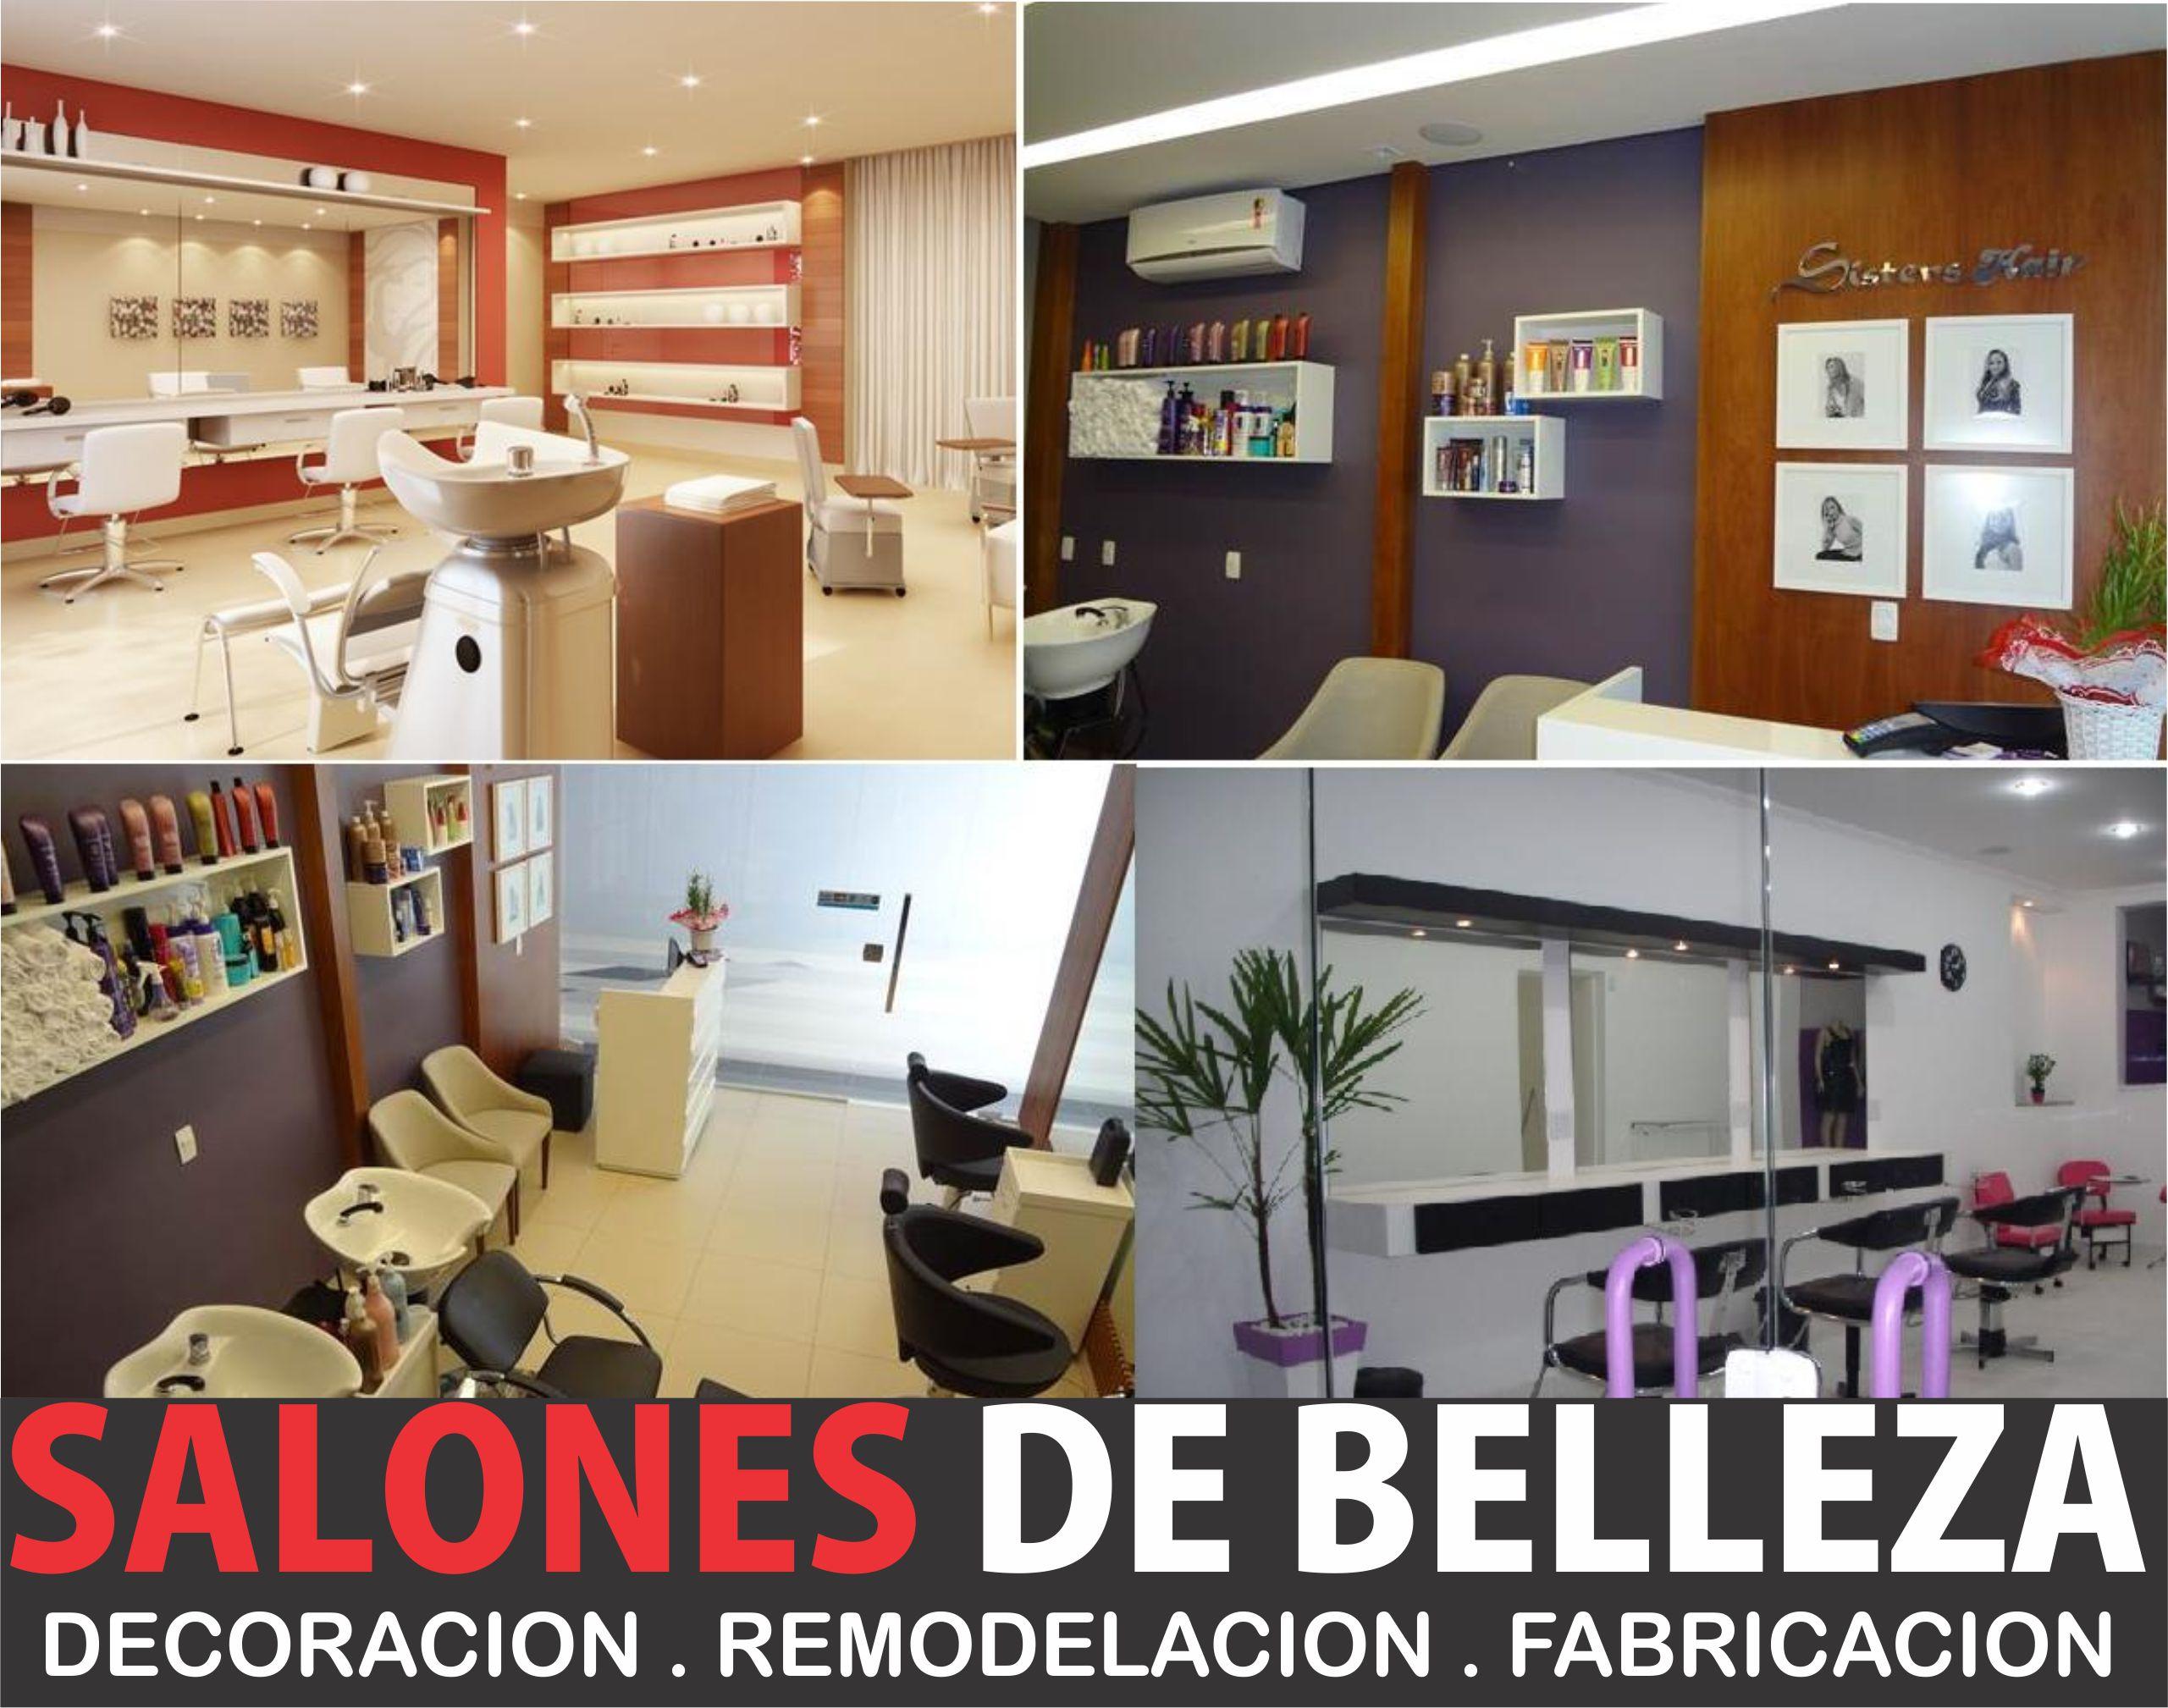 Decoracion De Salon De Belleza Vinilos Salon Belleza Spa